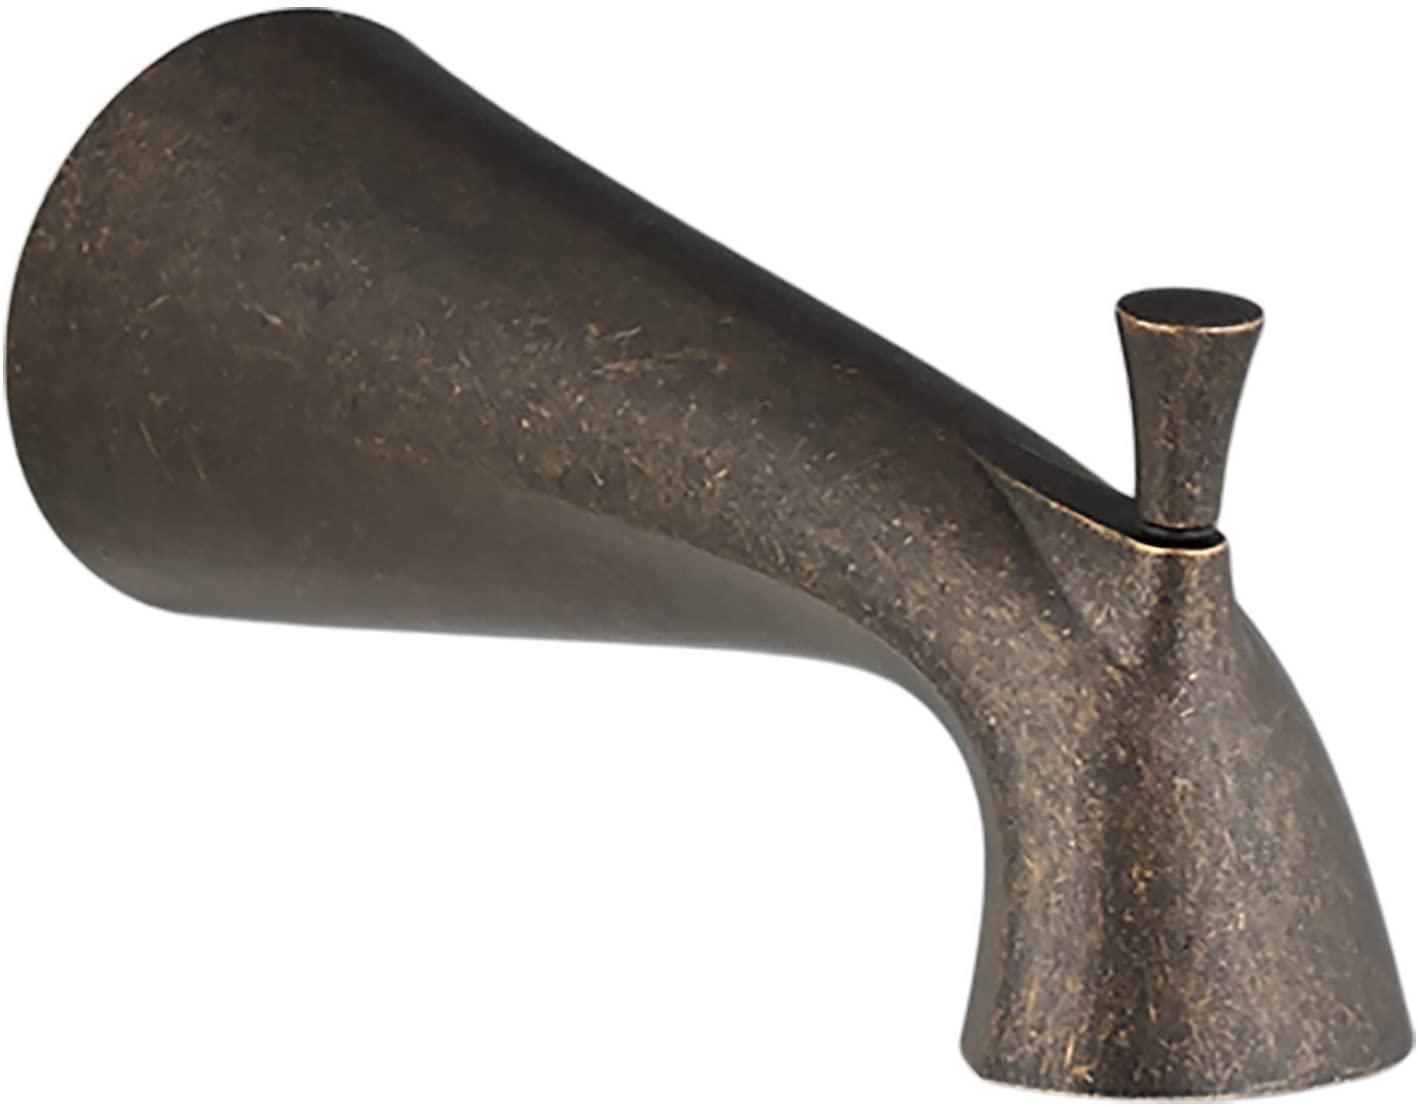 American Standard 8888019.224 Fluent Diverter Tub Spout, Oil Rubbed Bronze